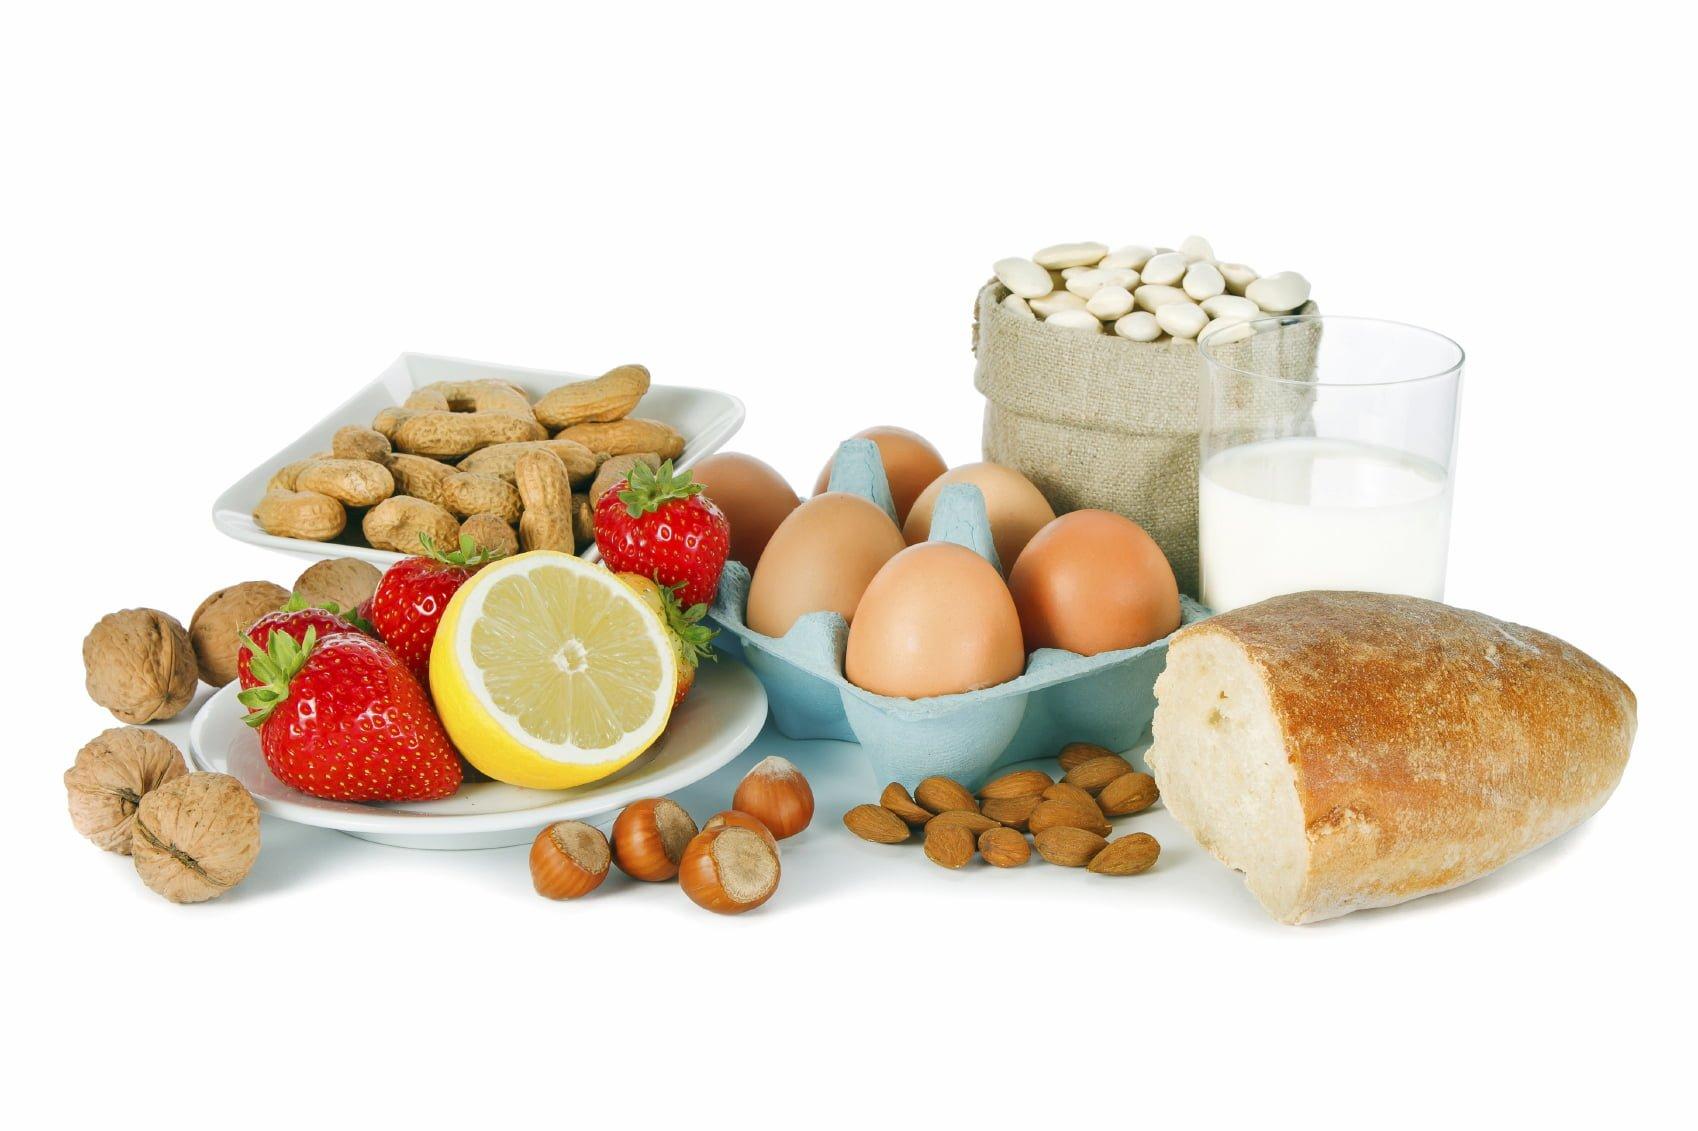 Food allergens (milk, eggs, bread, tree nuts, peanuts, fruits, etc.)